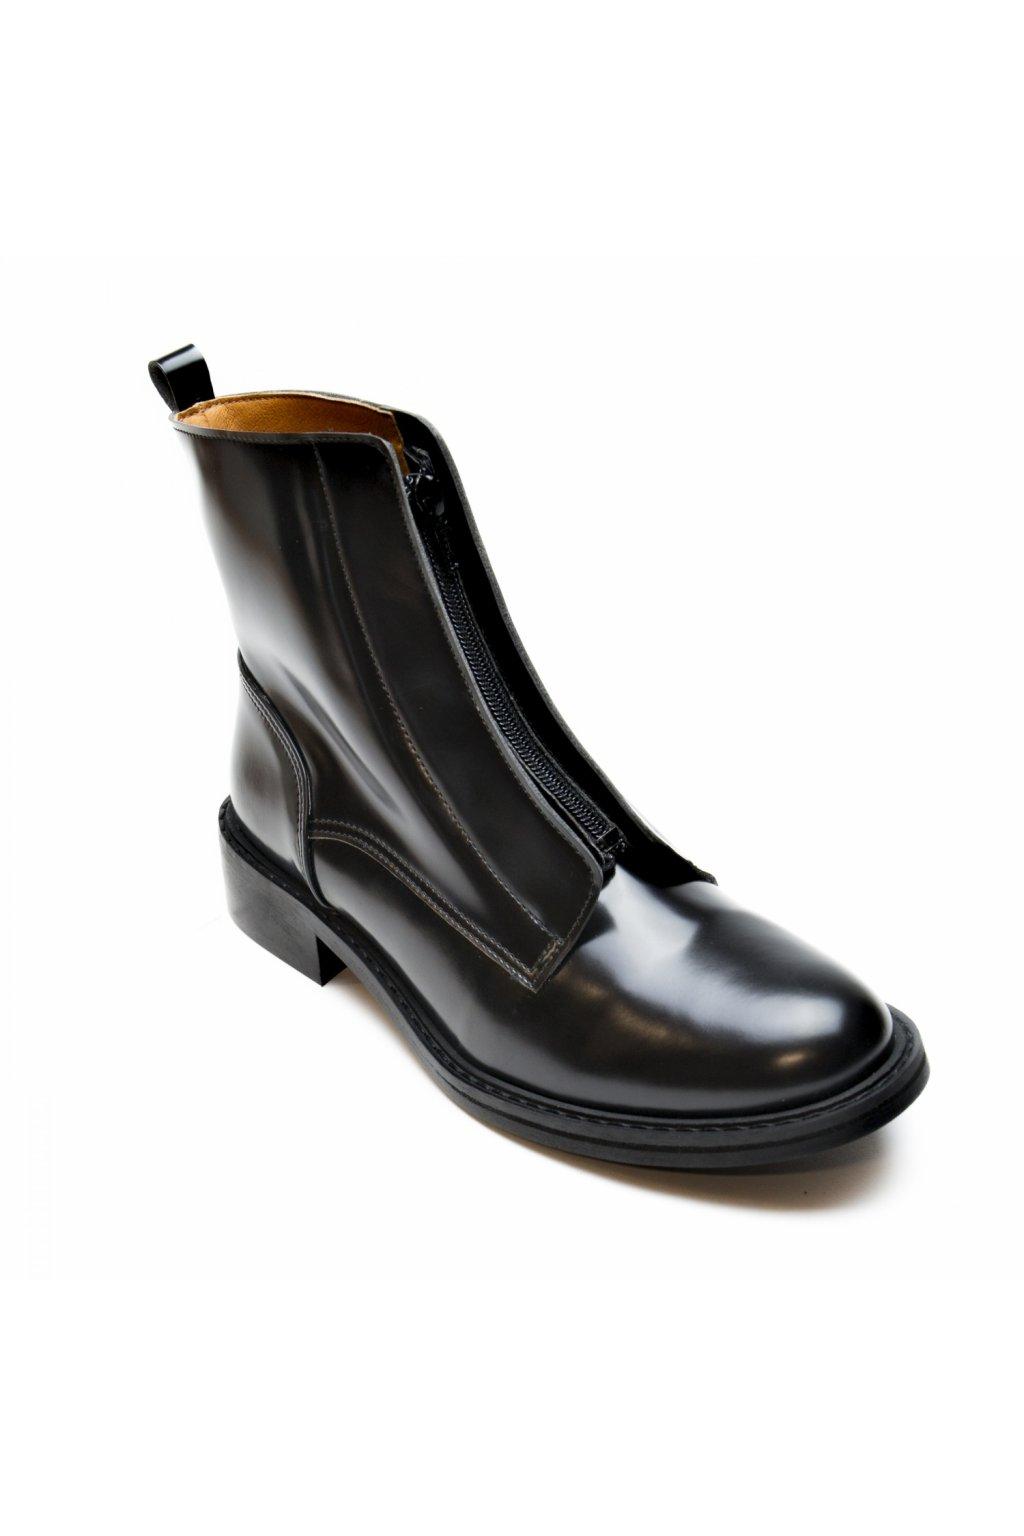 "Dámske čierne členkové topánky ""Zipme Black"""